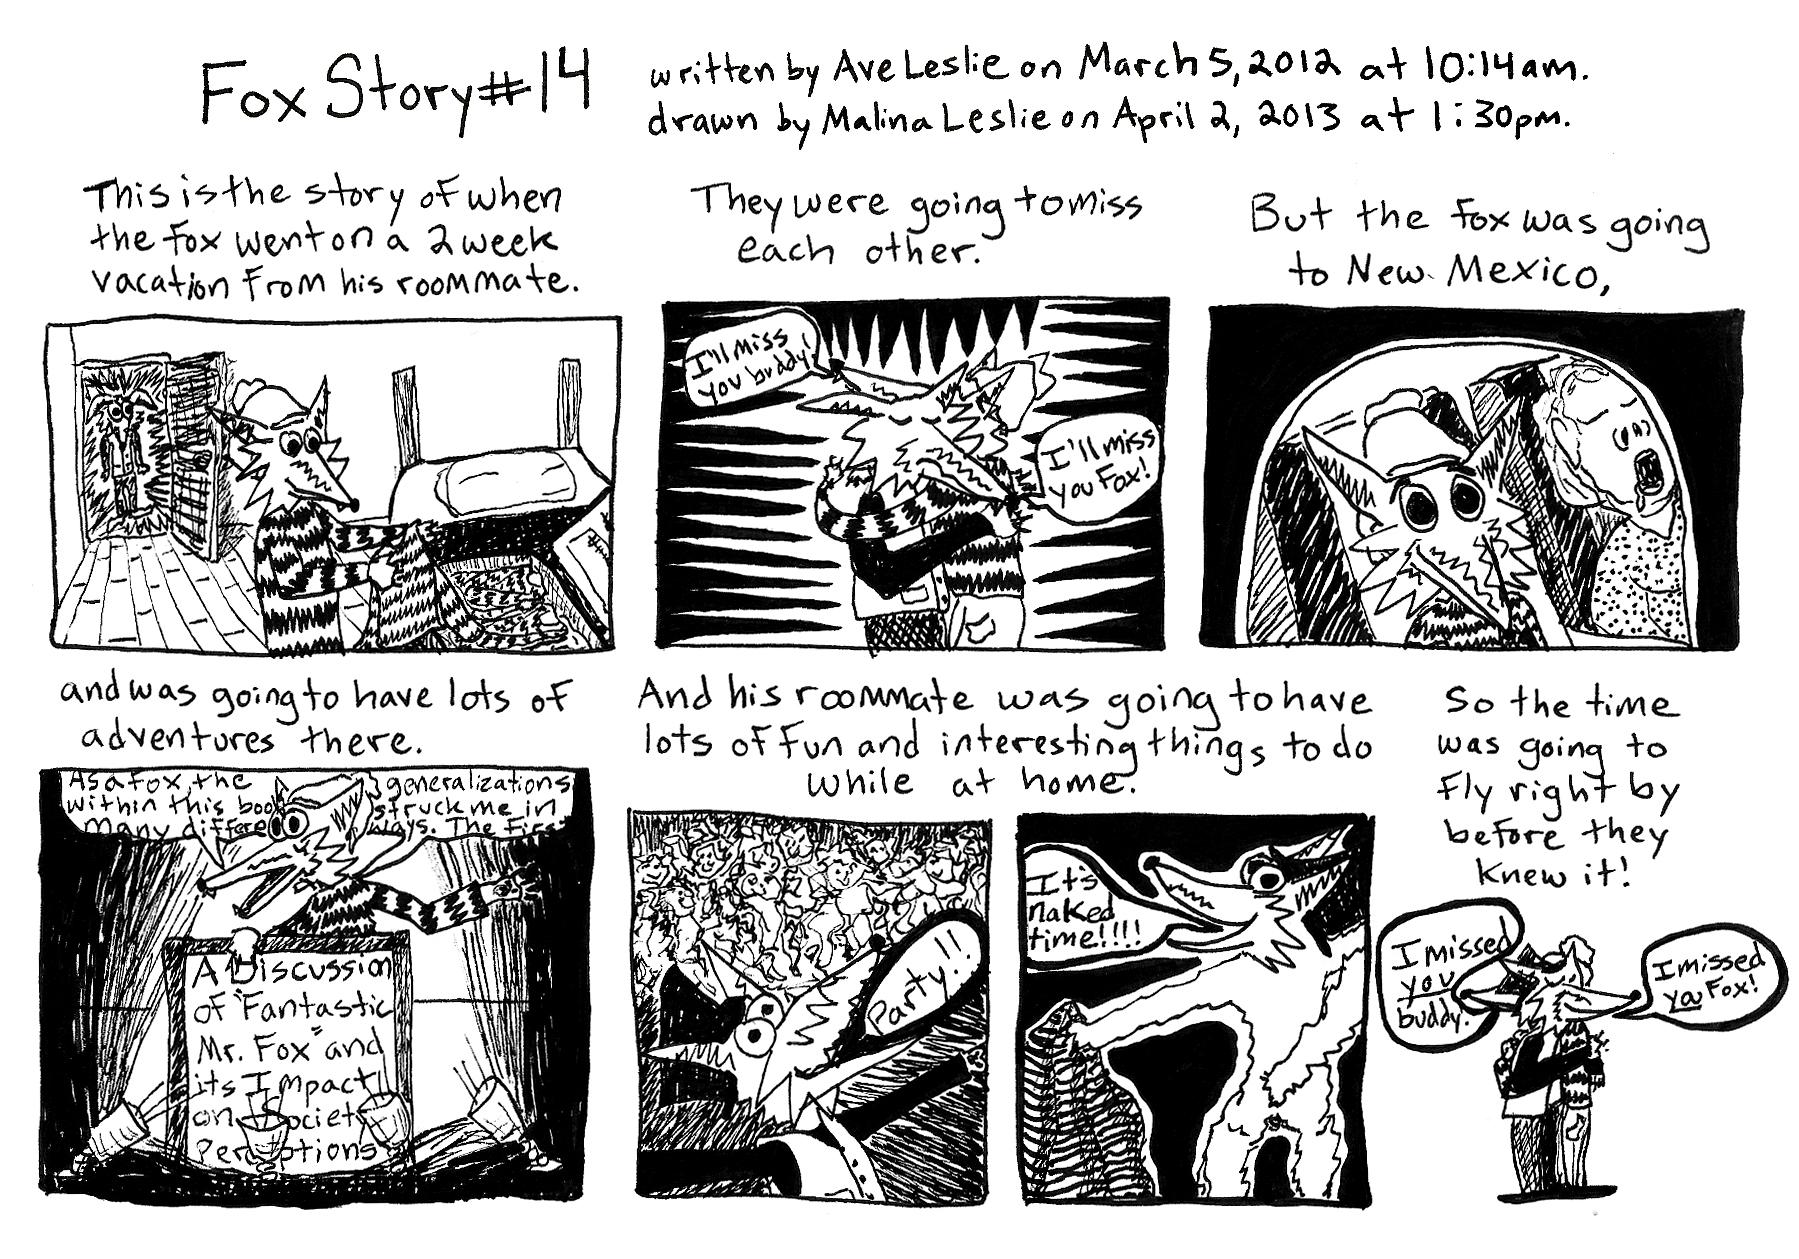 Fox Story 14